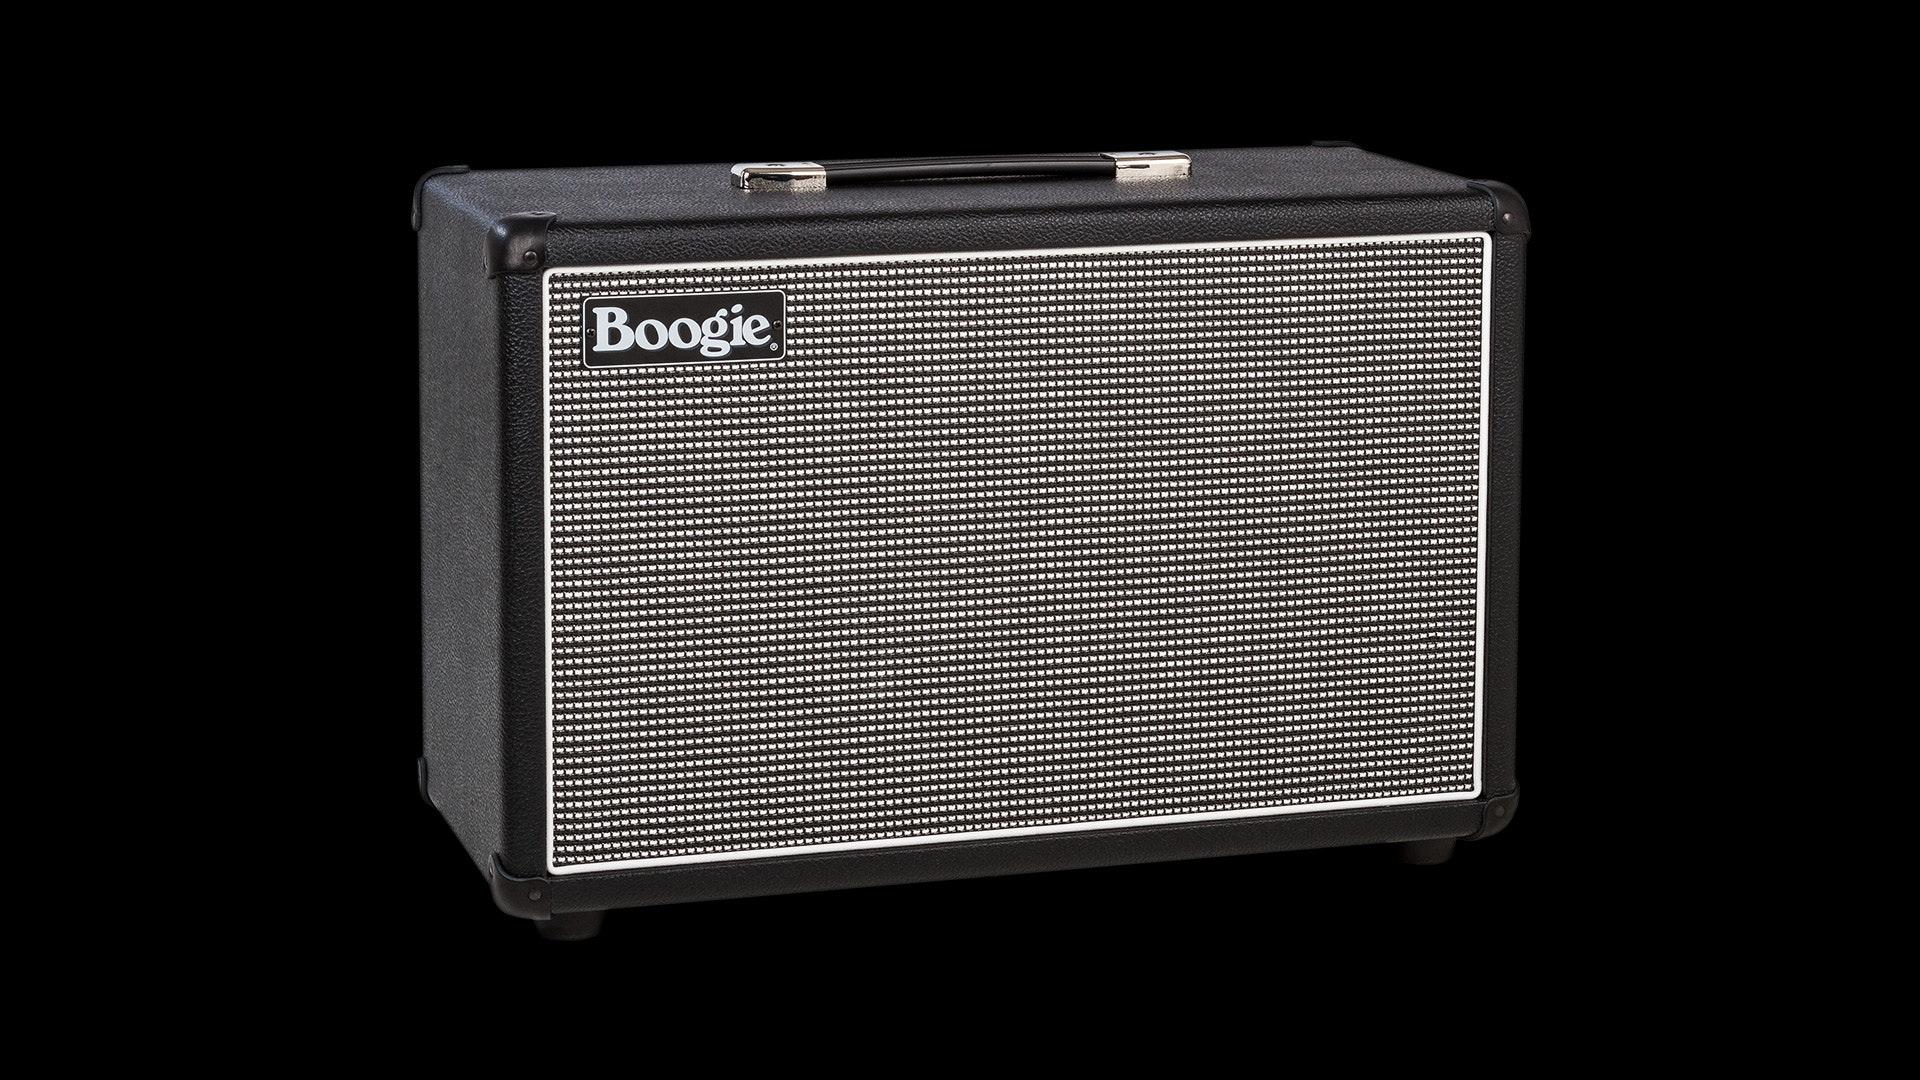 mesa boogie fillmore 23 1x12 guitar speaker cabinet mesa boogie. Black Bedroom Furniture Sets. Home Design Ideas